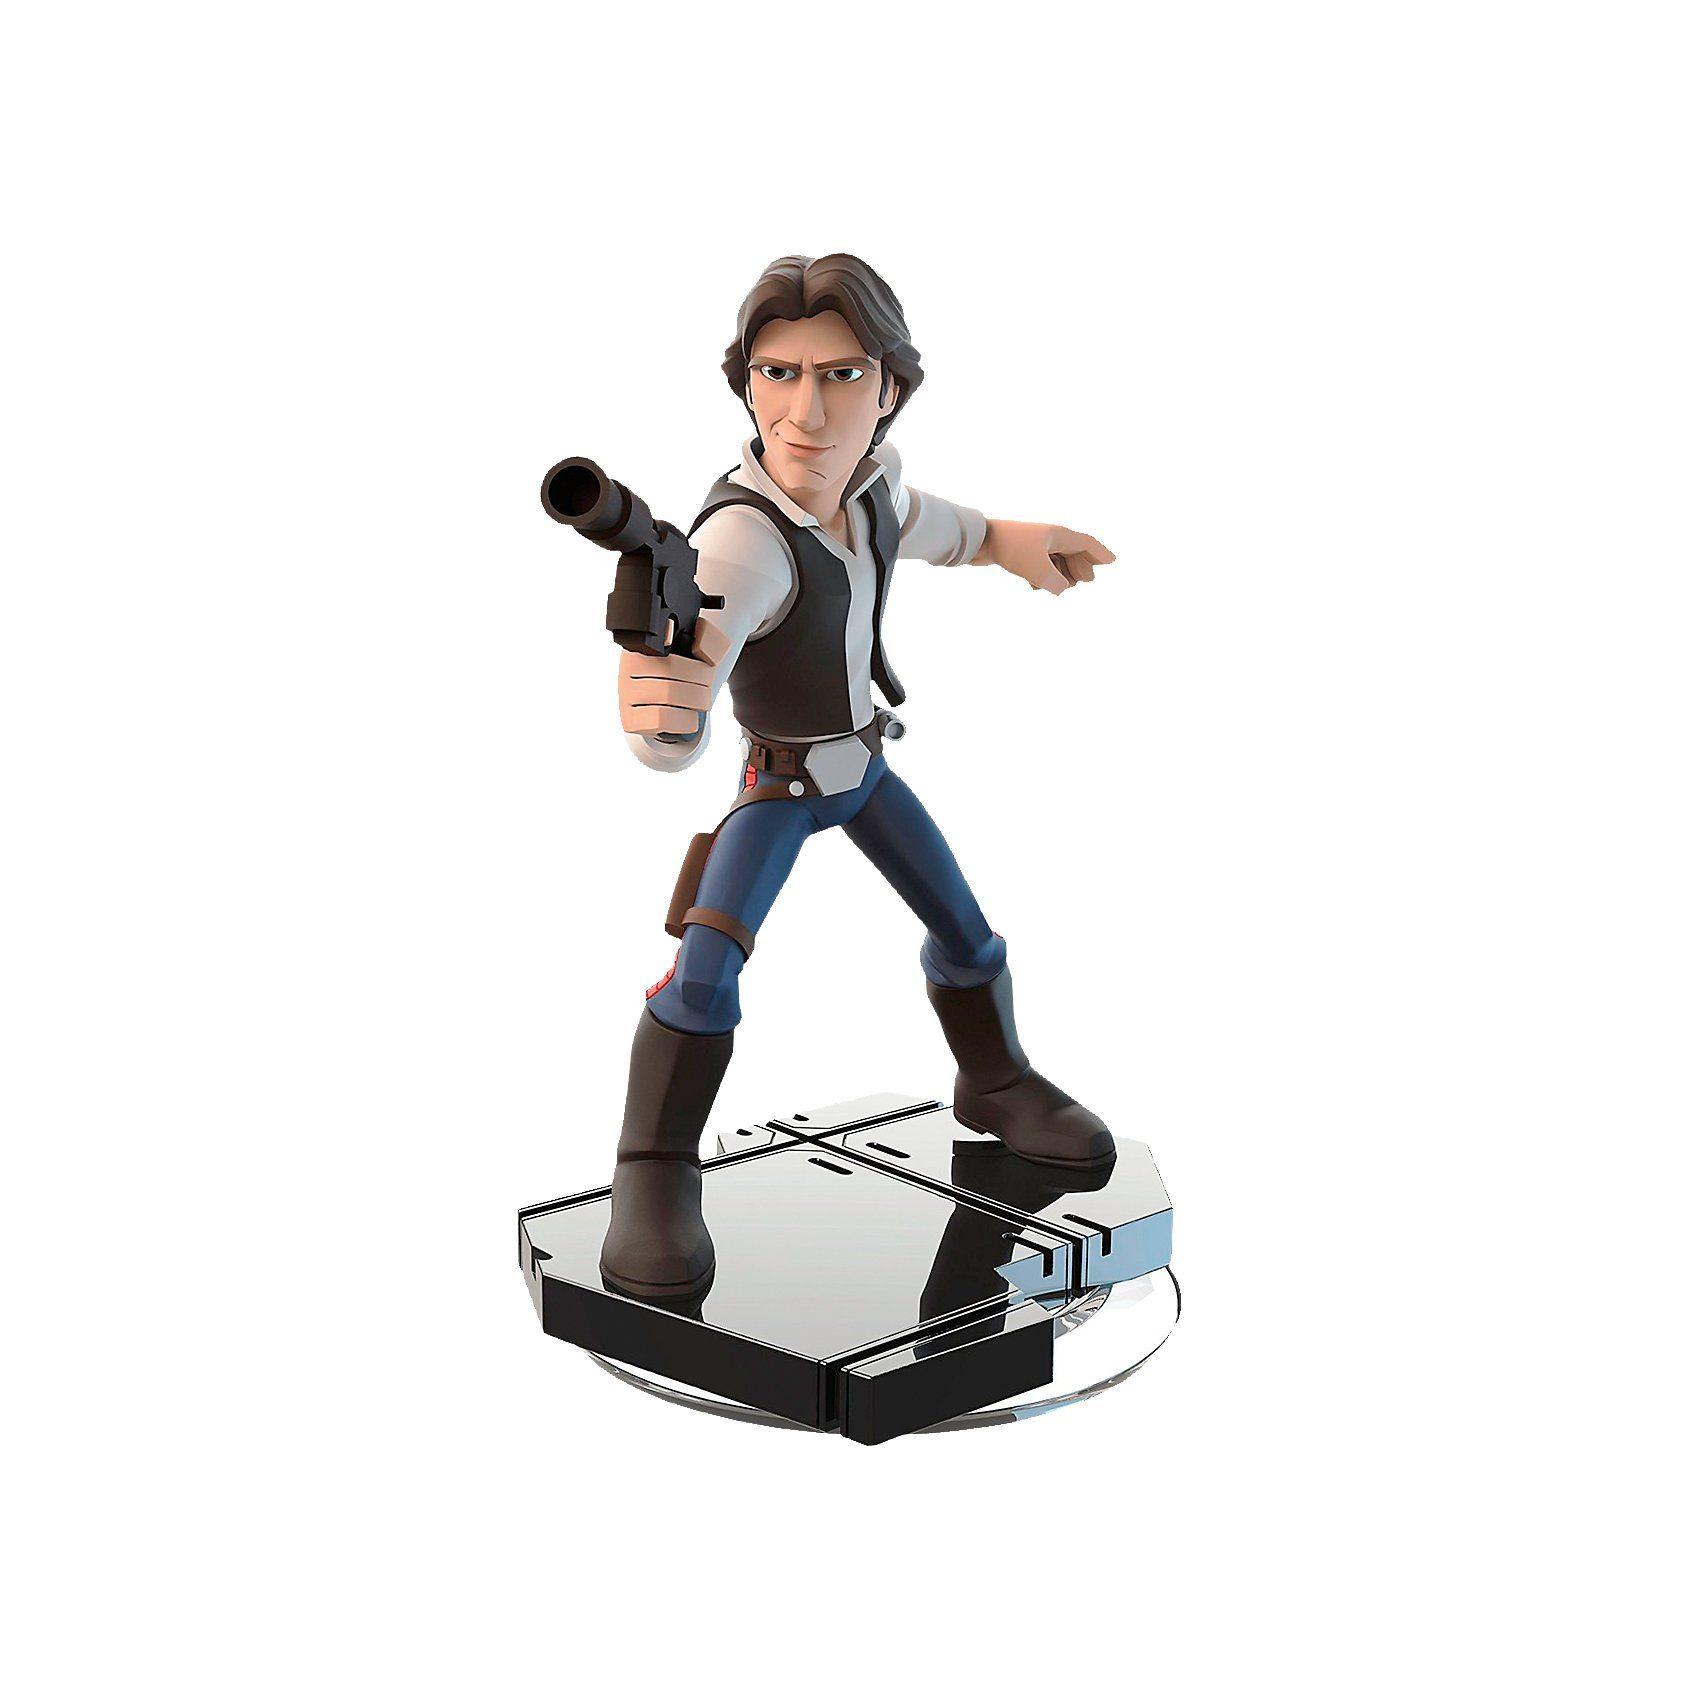 ak tronic Disney Infinity 3.0: Einzelfigur Han Solo